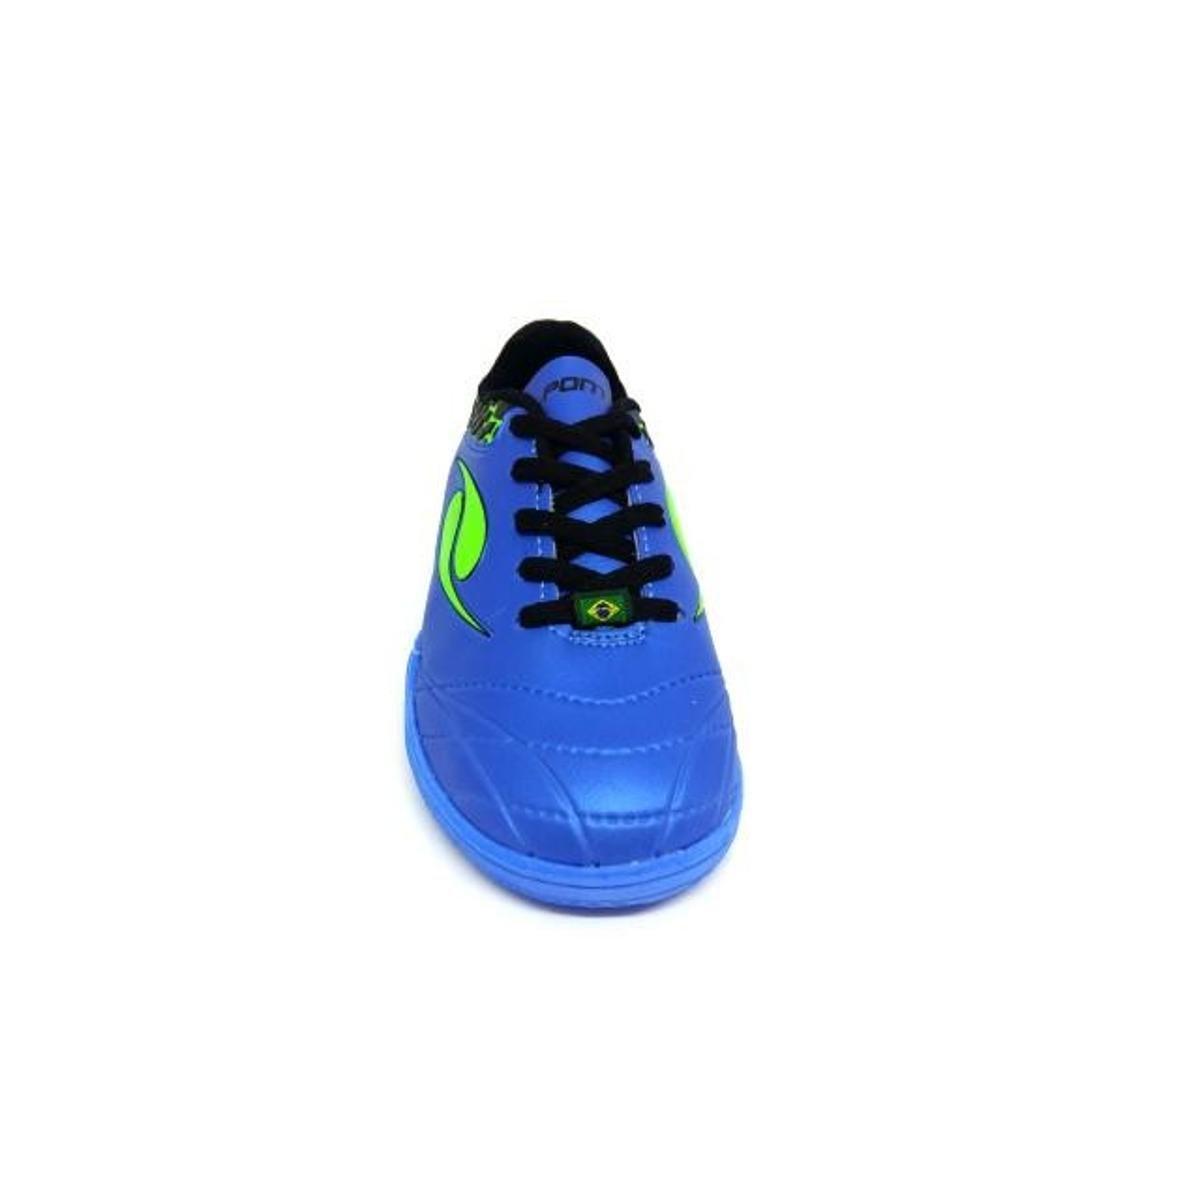 Chuteira Futsal infantil Dalponte Eletric - Azul - Compre Agora ... 7ea25bf079803